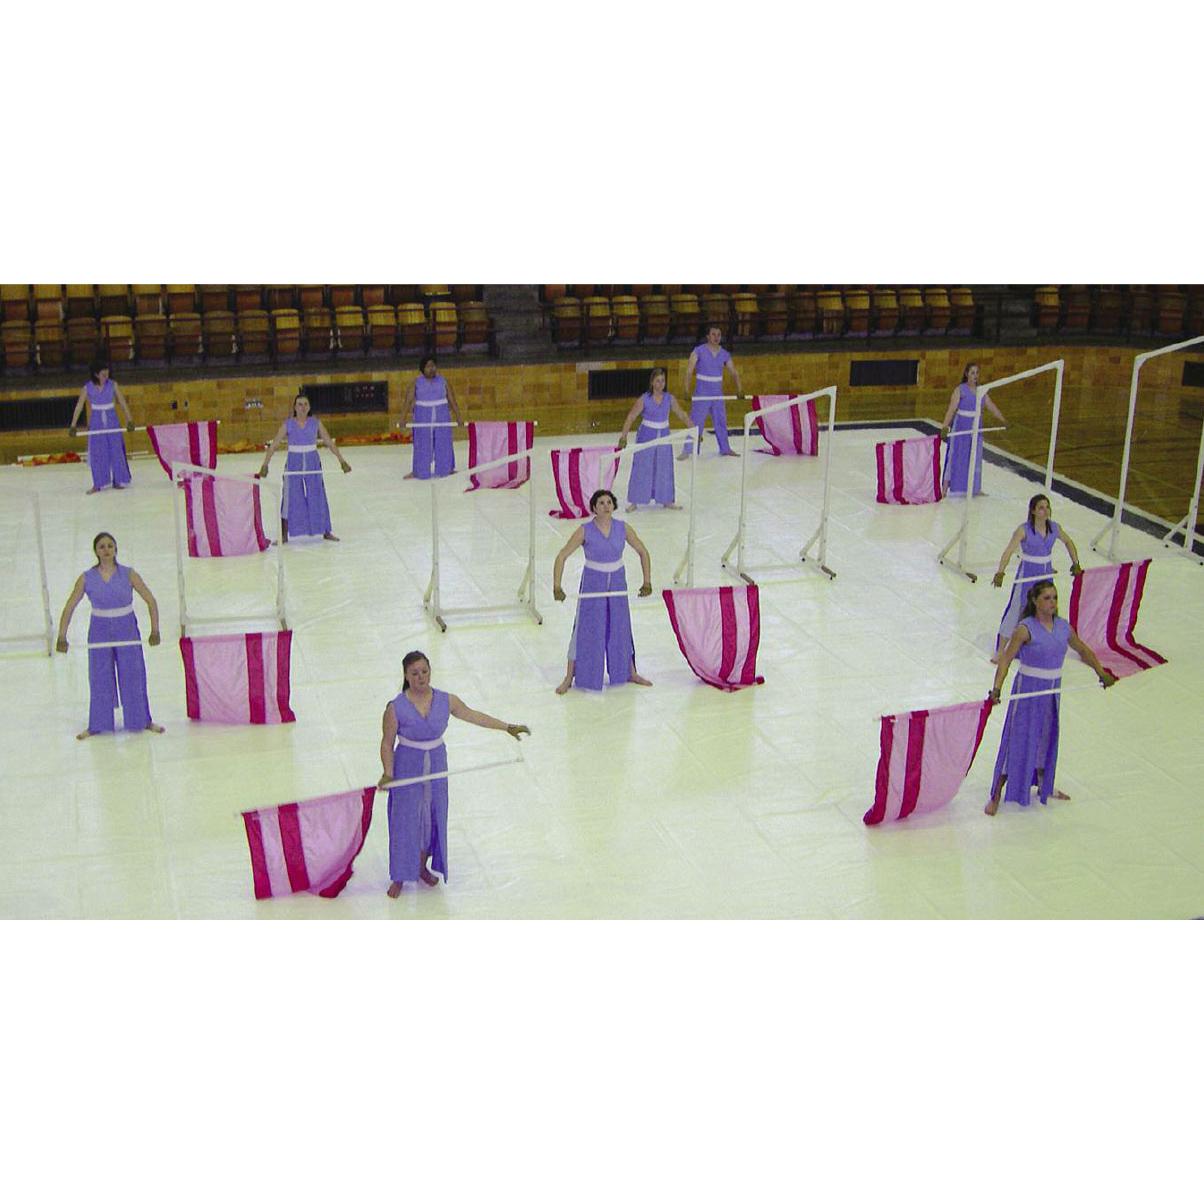 Floor Tarps